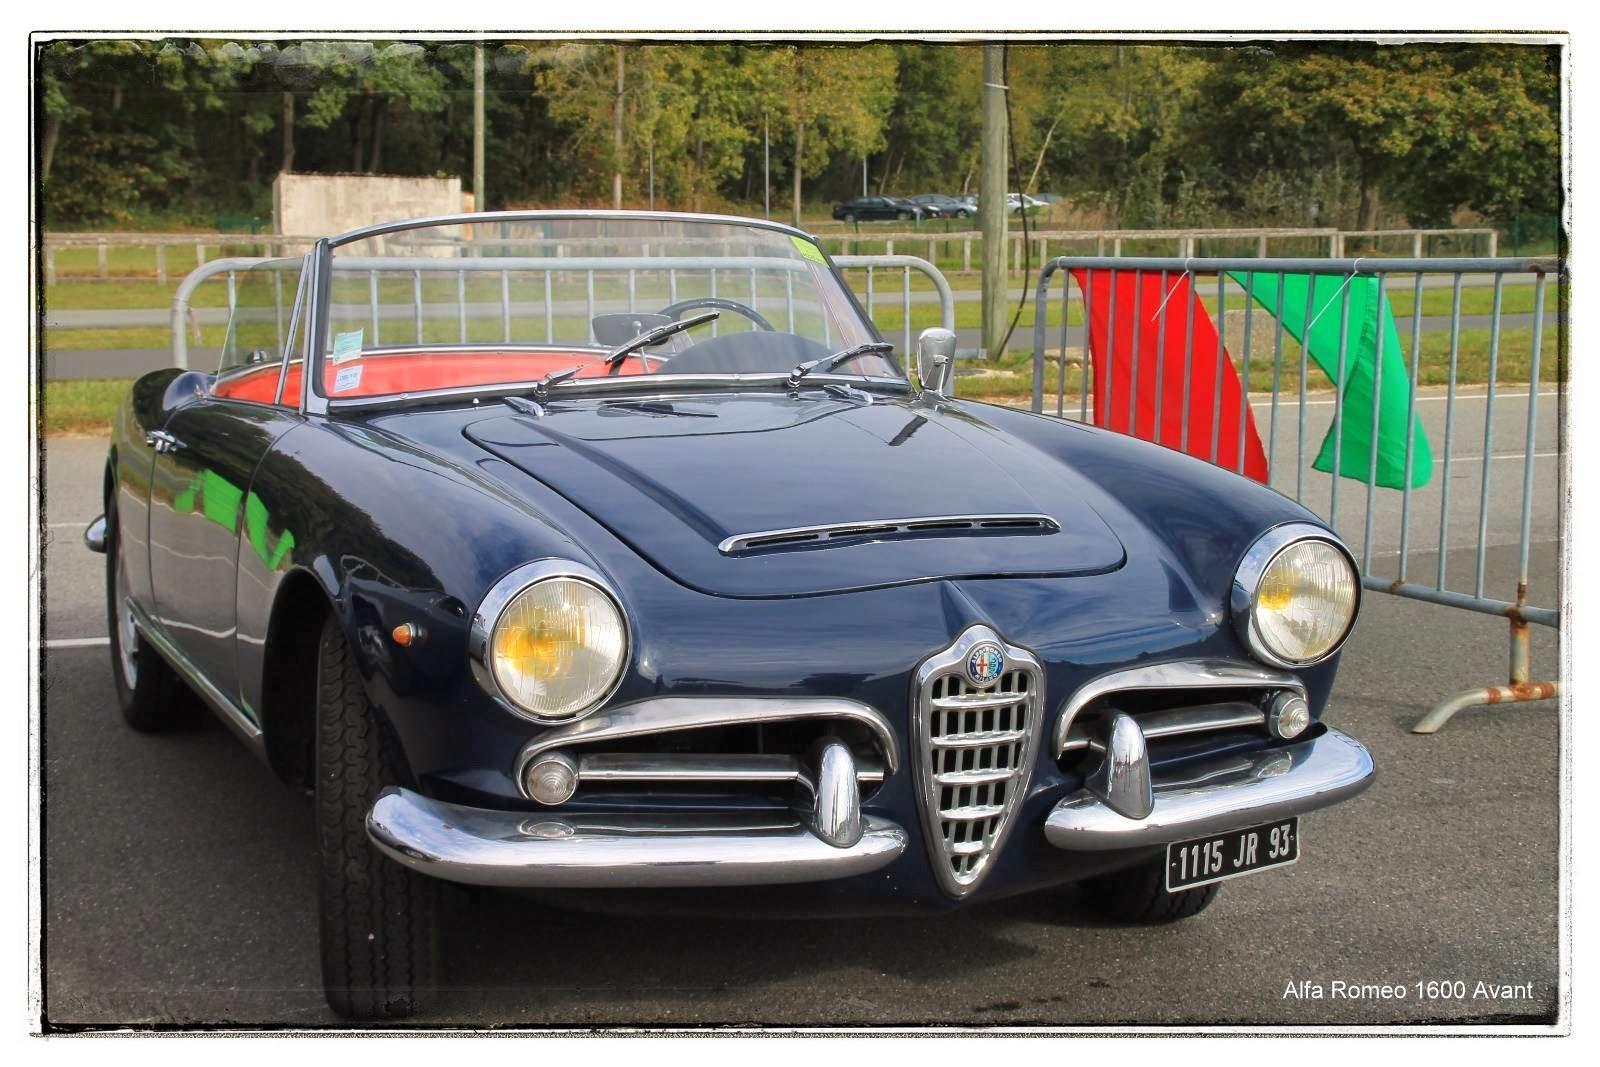 Alfa Romeo Giulia 1600 Spider 1964 - Italian Meeting